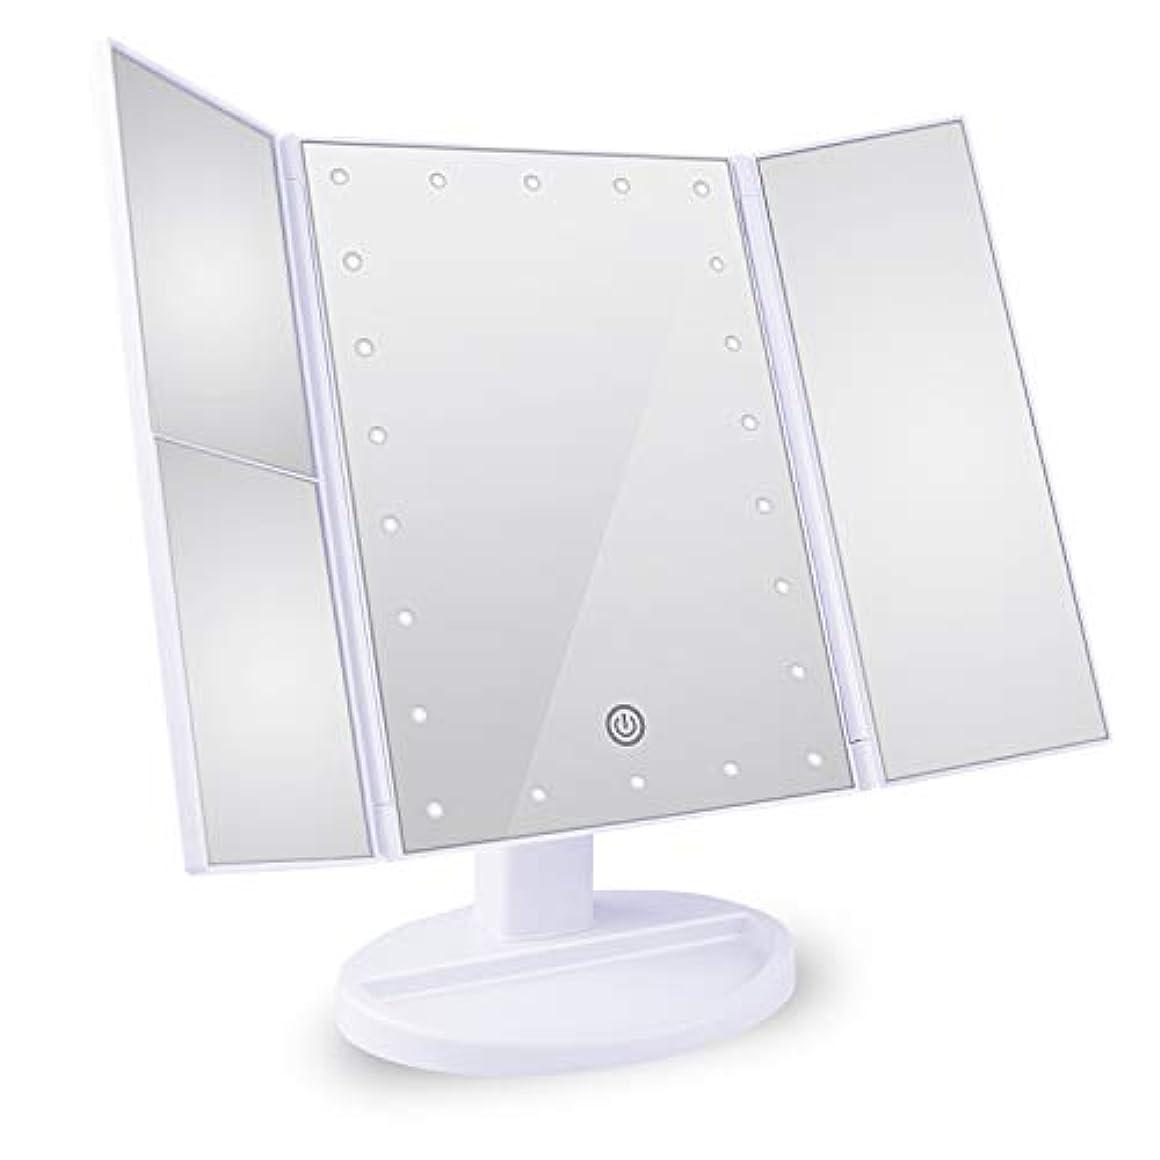 Tree. NB 化粧鏡 卓上鏡 拡大鏡 鏡 メイクミラー 2倍&3倍拡大可能 LEDライトミラー 明るさ調節可能 180°回転 電池&USB 2WAY給電